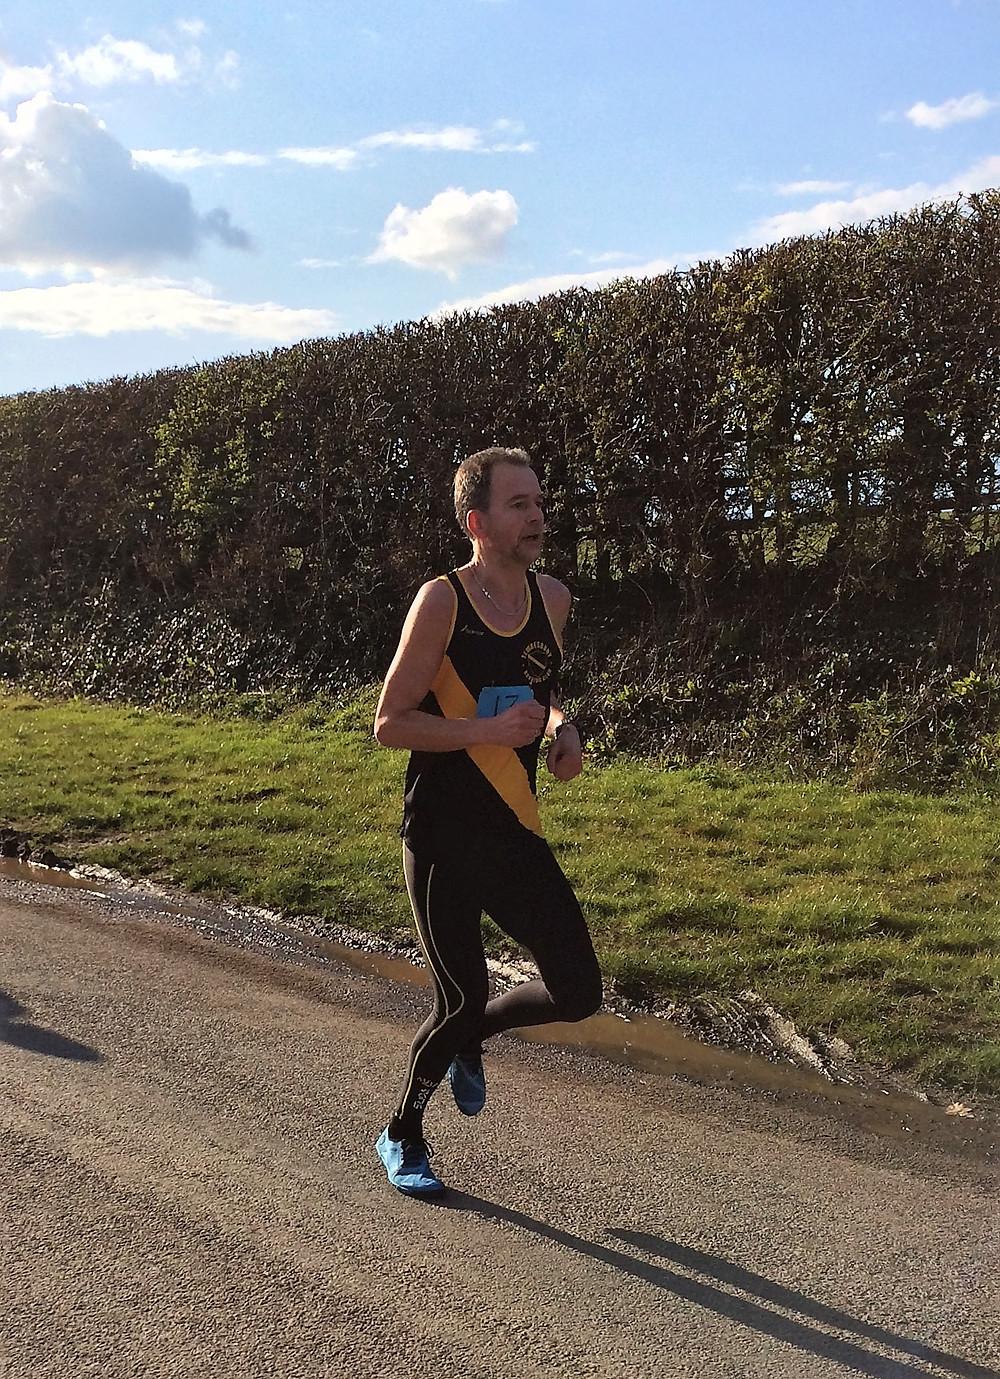 Paul Booth racing well.